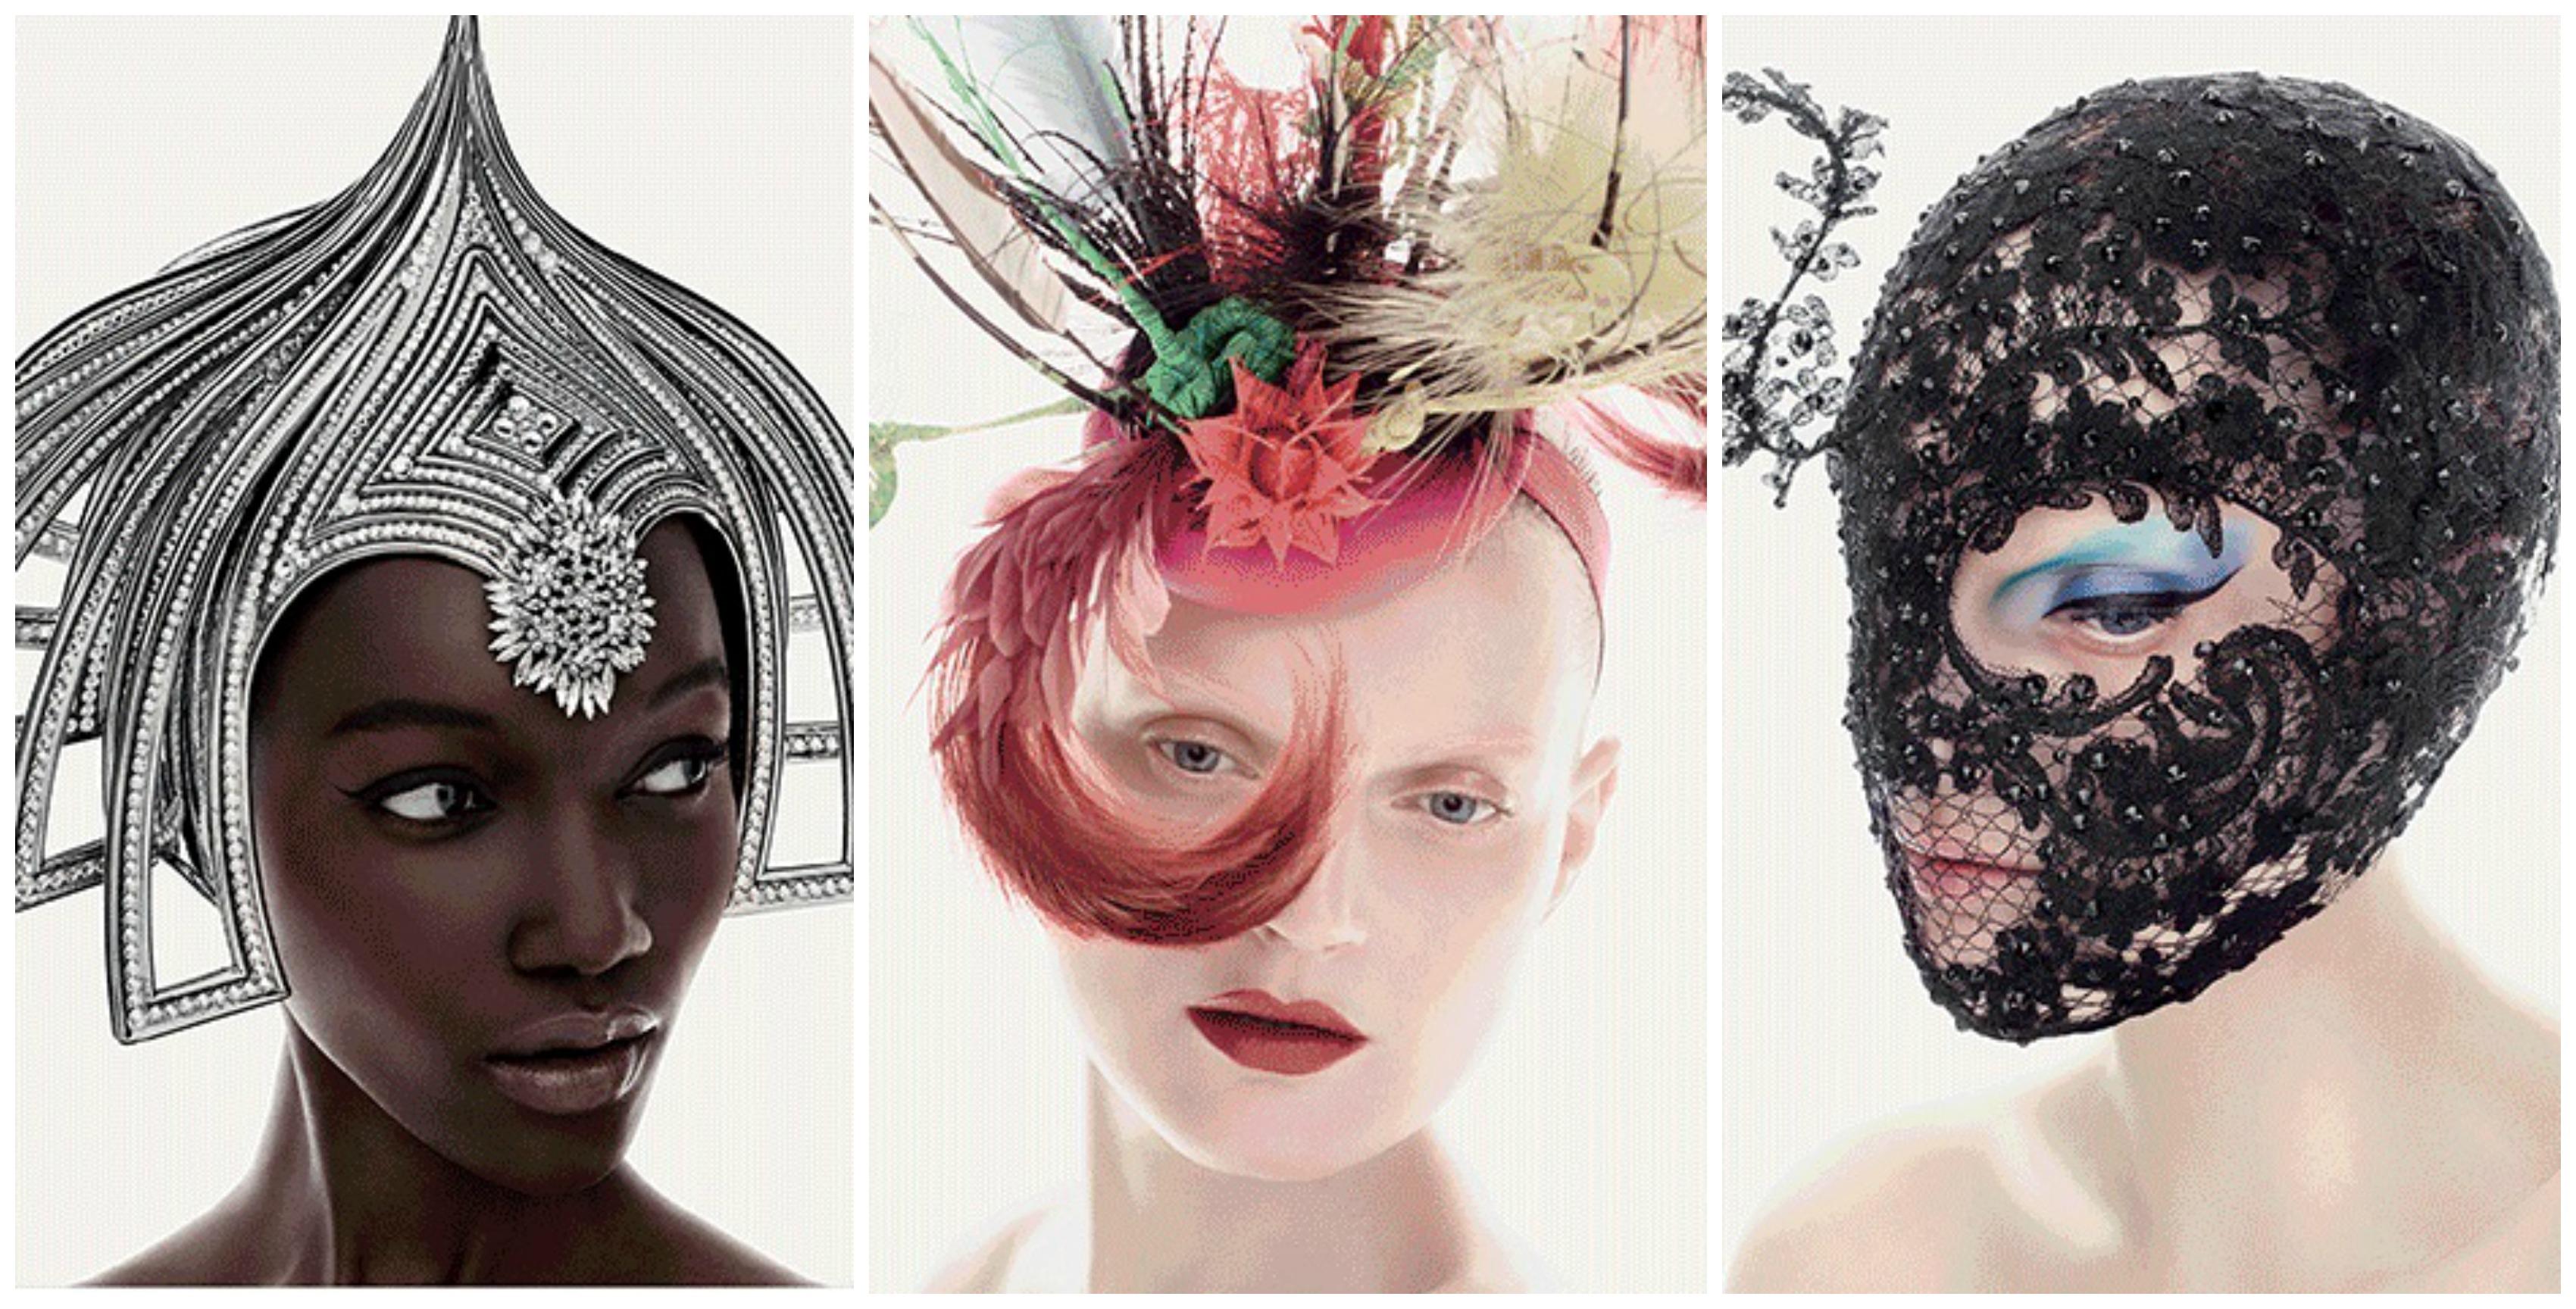 MAC cosmetics-Philip Treacy-vanaf 18 april verkrijgbaar-make up-lifestyle-GoodGirlsCompany-samenwerking MAC en Philip Treacy